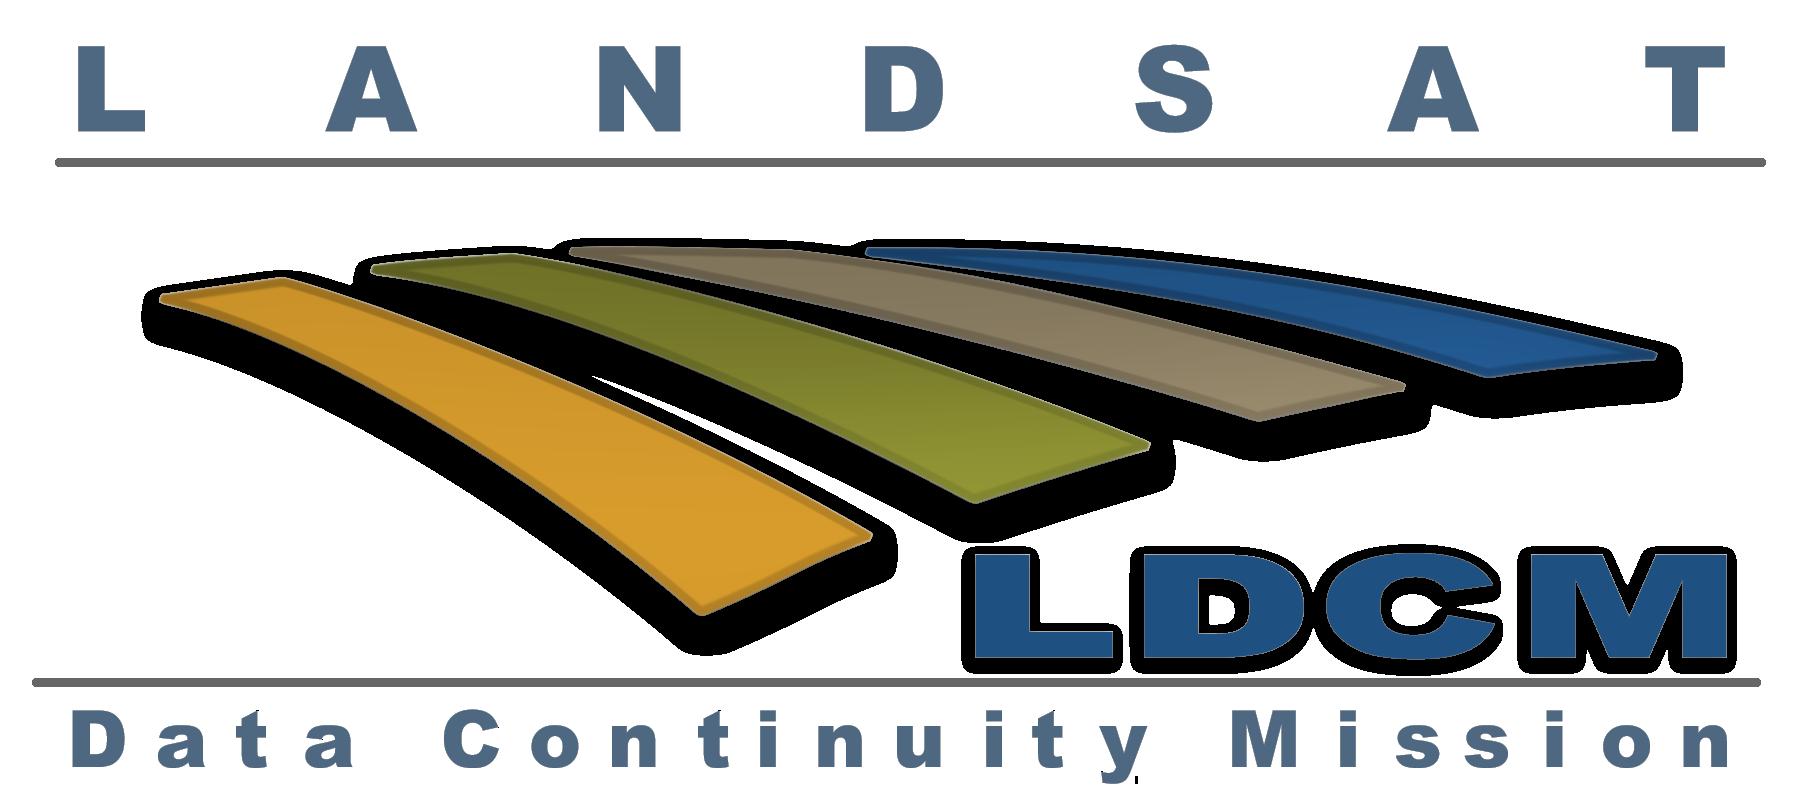 File:Landsat Data Cont... Zoe Saldana